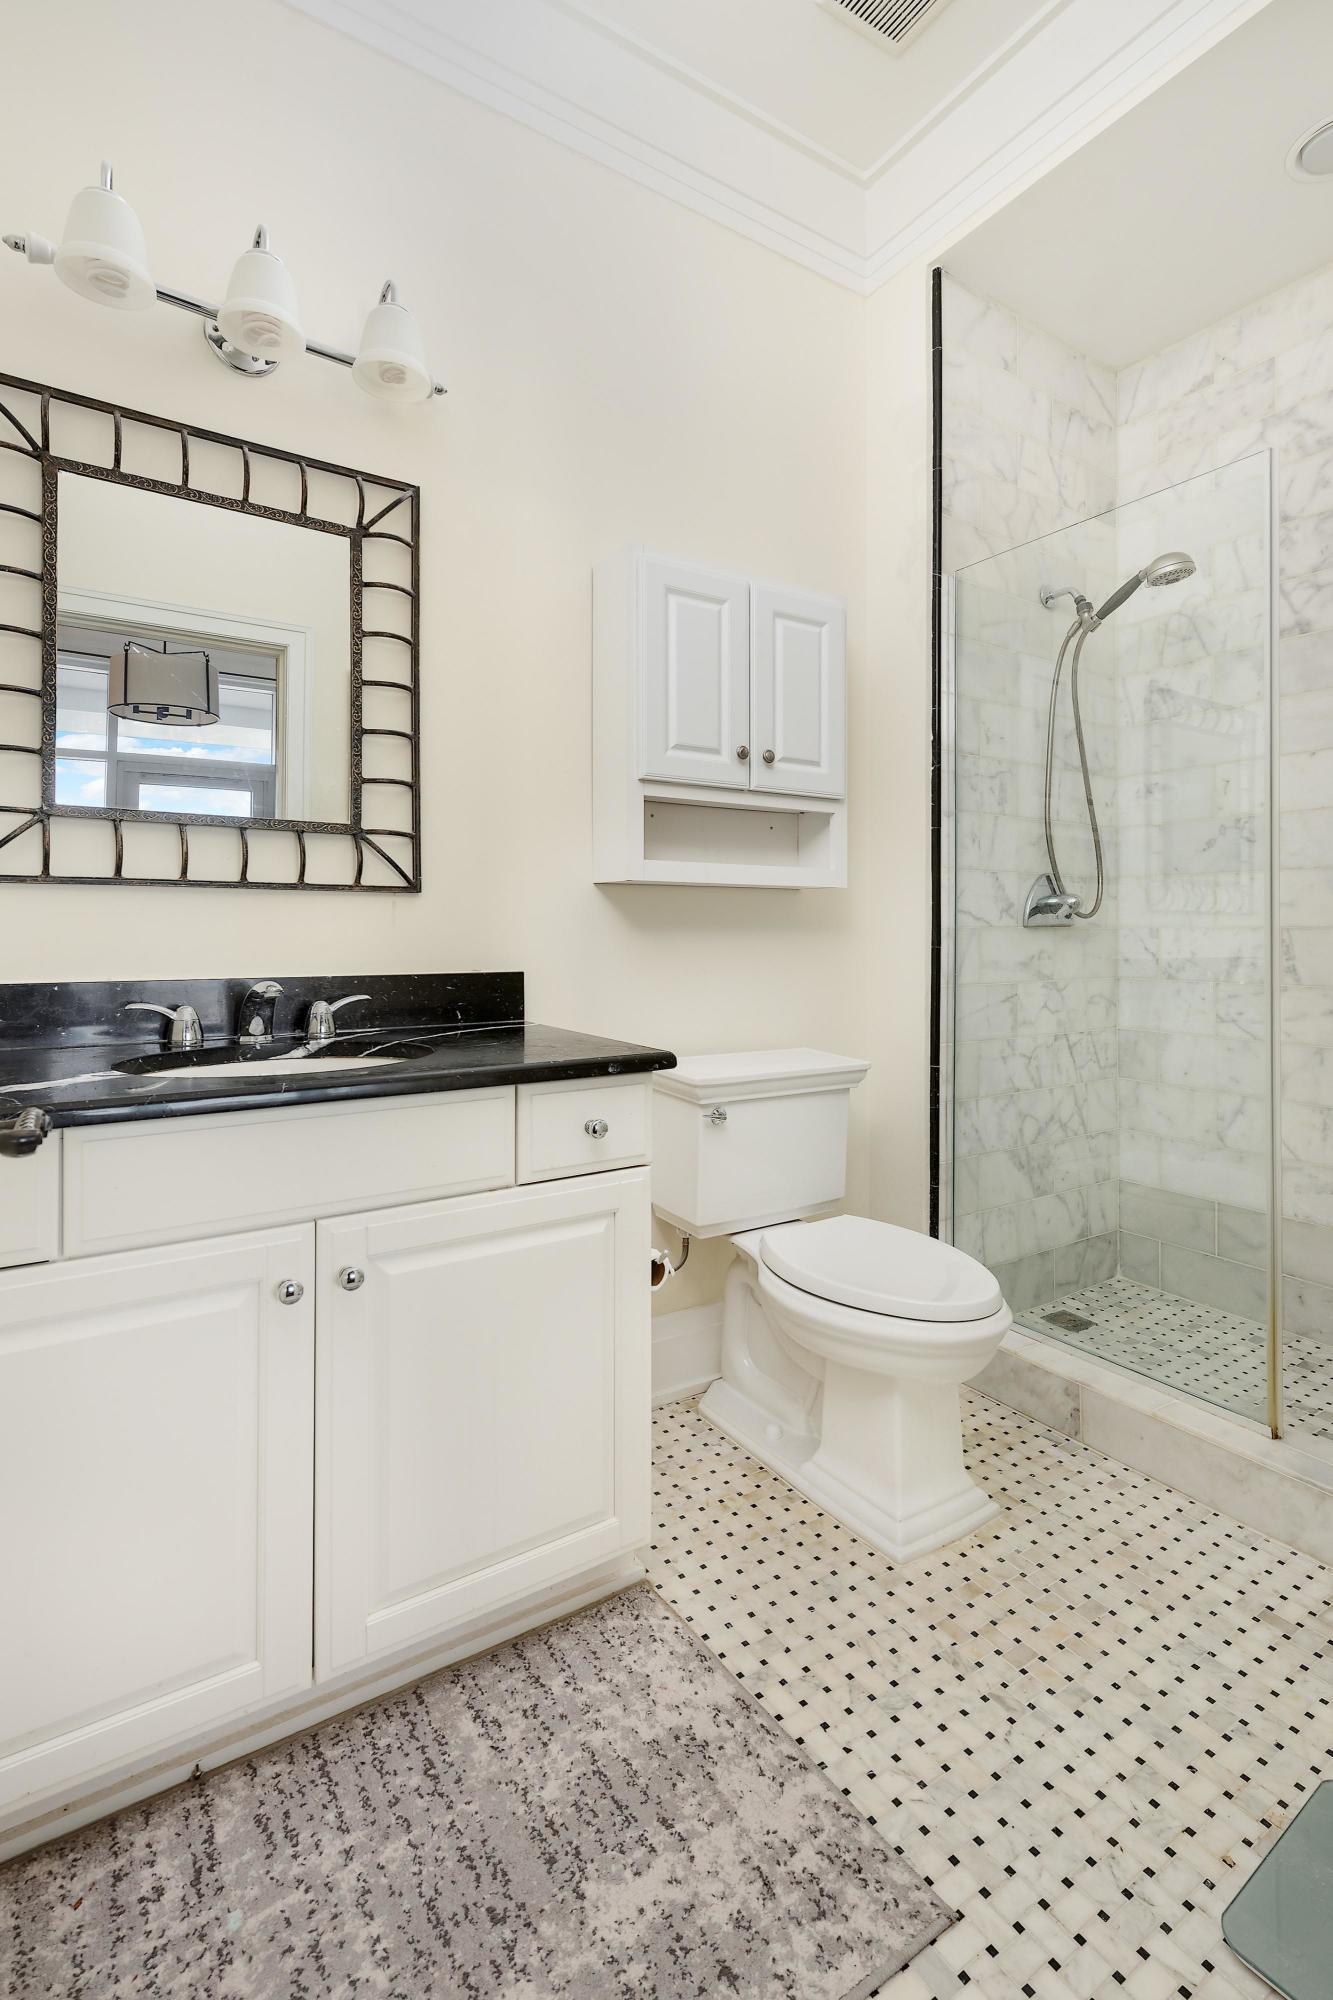 Tides Condominiums Homes For Sale - 363 Cooper River, Mount Pleasant, SC - 17